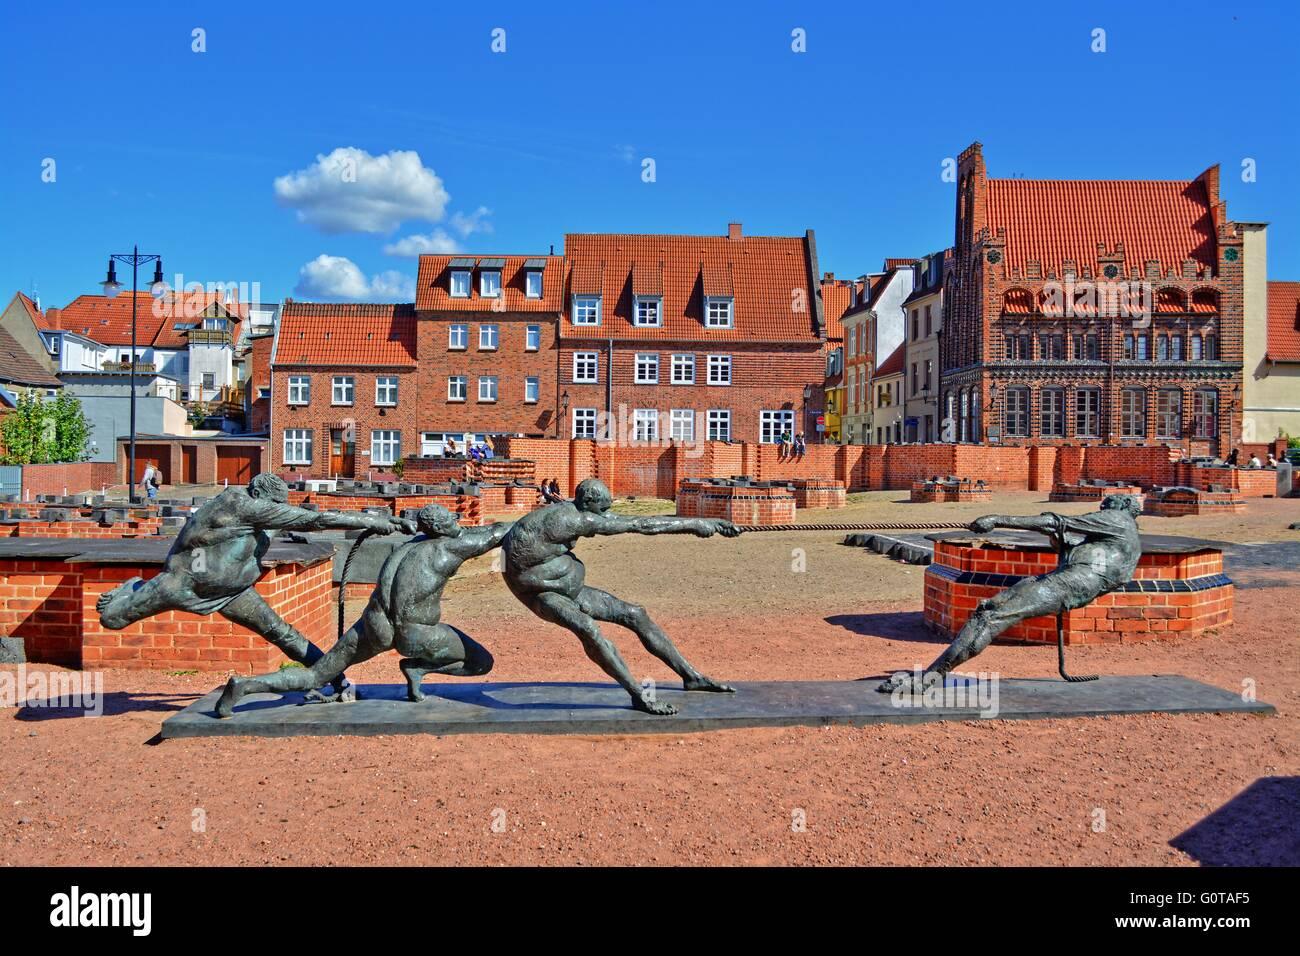 Wismar, German city on the Baltic Coast, St. Mary, parish church memorial - Stock Image